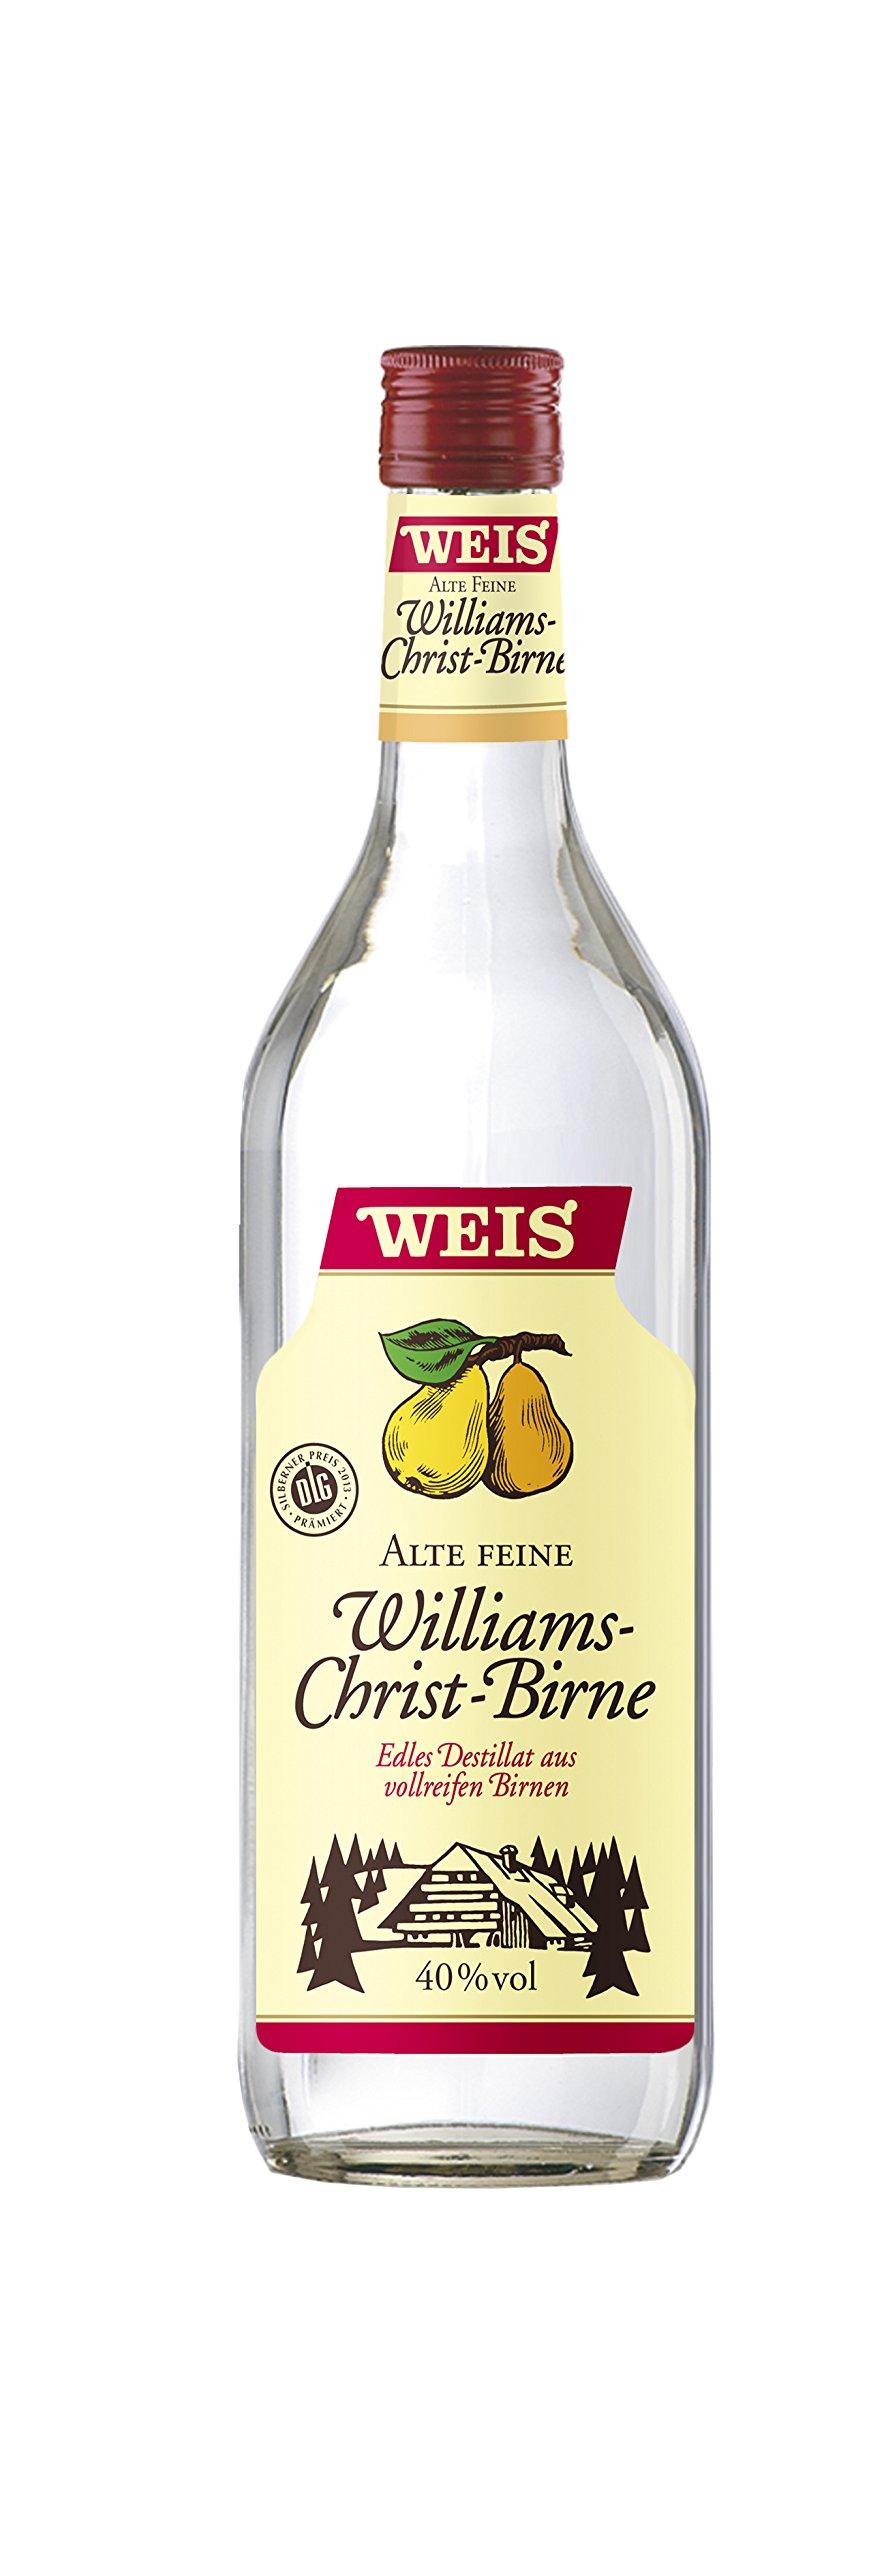 Weis-Williams-Christ-Birnenbrand-1-x-1-l